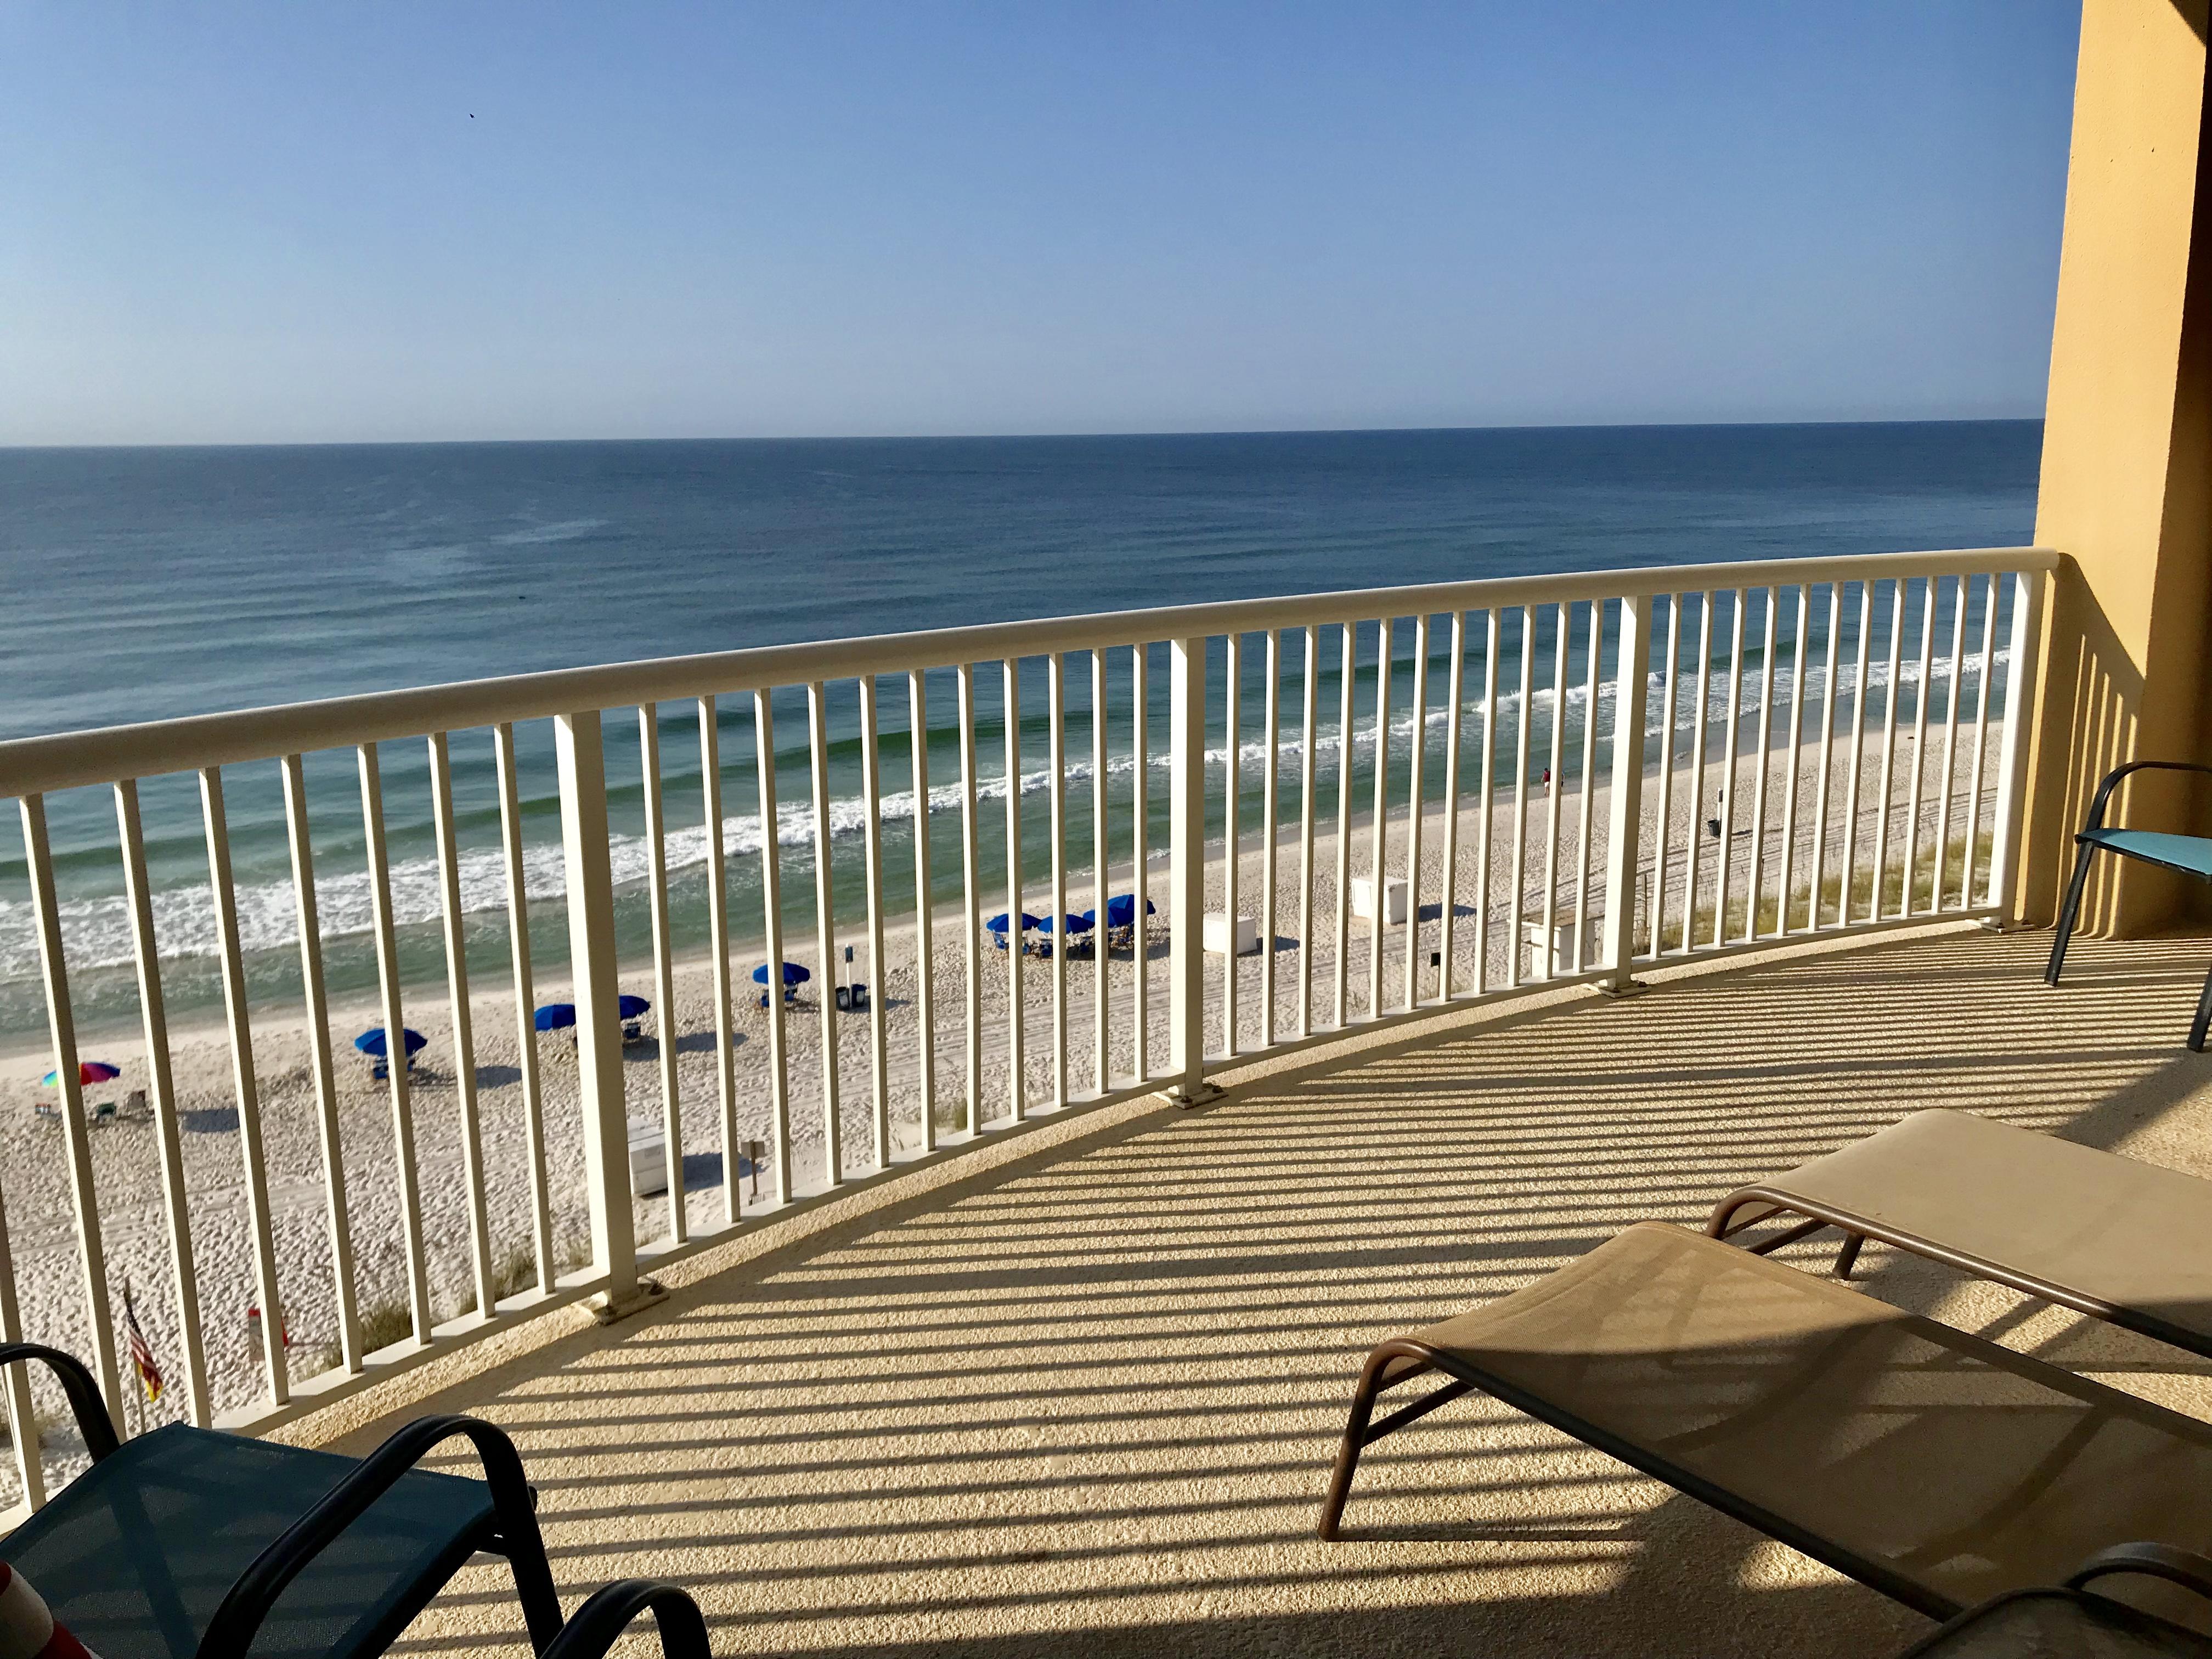 Island Royale  705 Condo rental in Island Royale in Gulf Shores Alabama - #36